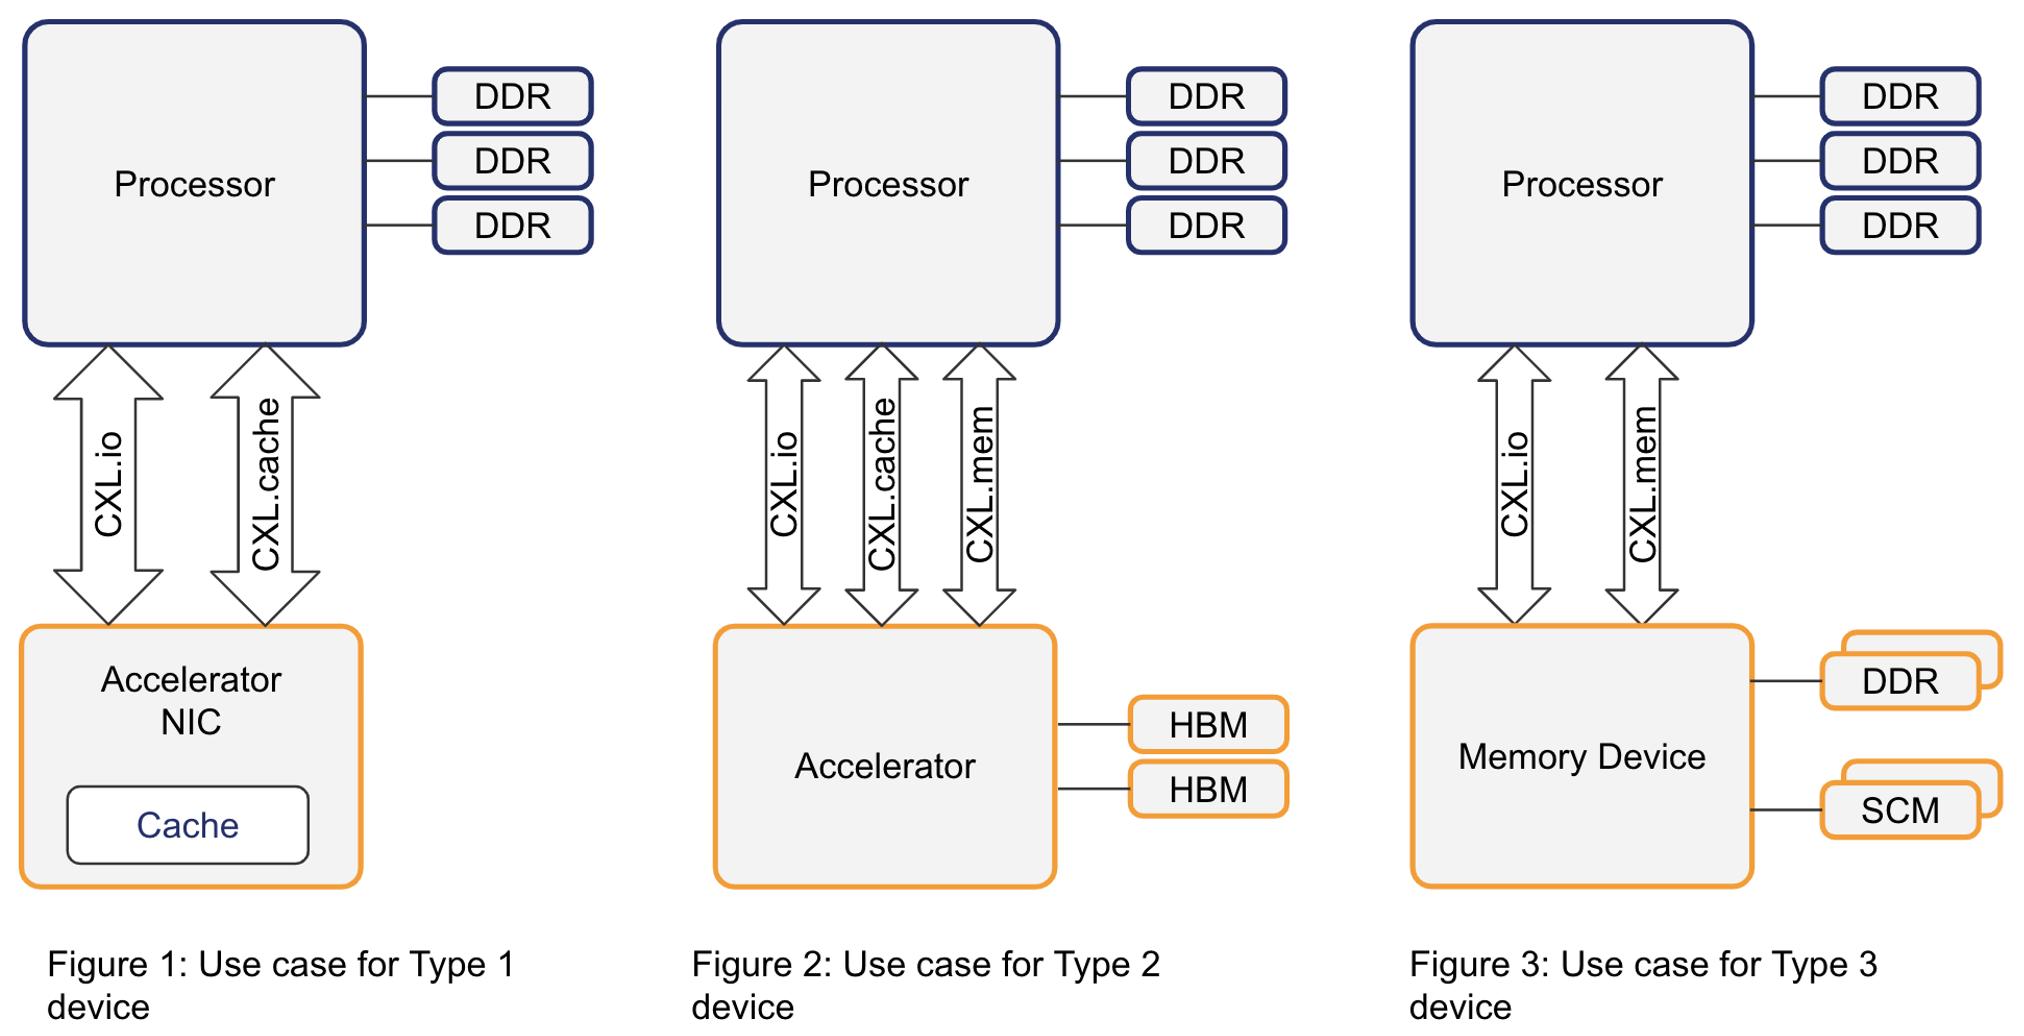 Three types of CXL devices